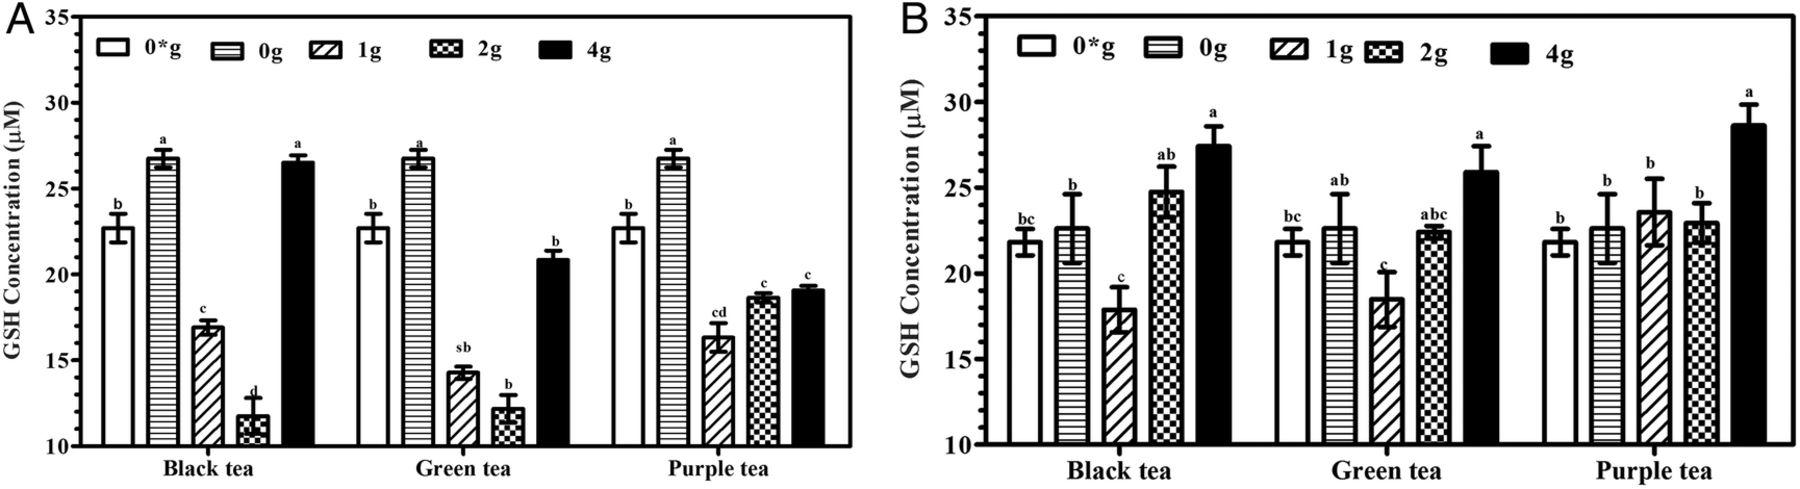 Fortification of alcoholic beverages (12% v/v) with tea (Camellia